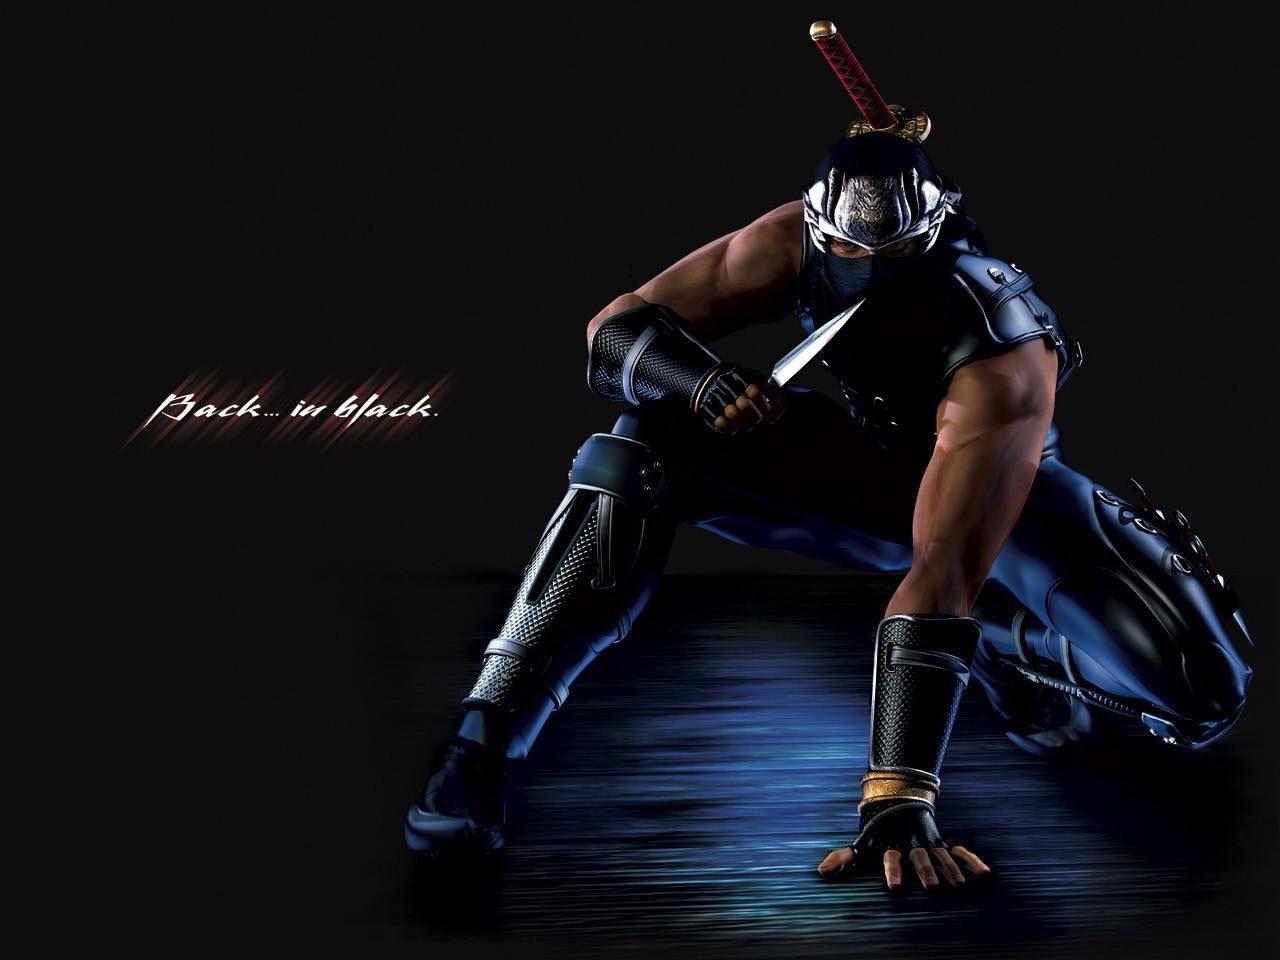 http://2.bp.blogspot.com/-87JZJW9wB9E/TdU335LQs7I/AAAAAAAABhg/NC7w-_i-HIo/s1600/Ninja-Gaiden-Black-1-VX1YNN44XL-1280x960.jpg